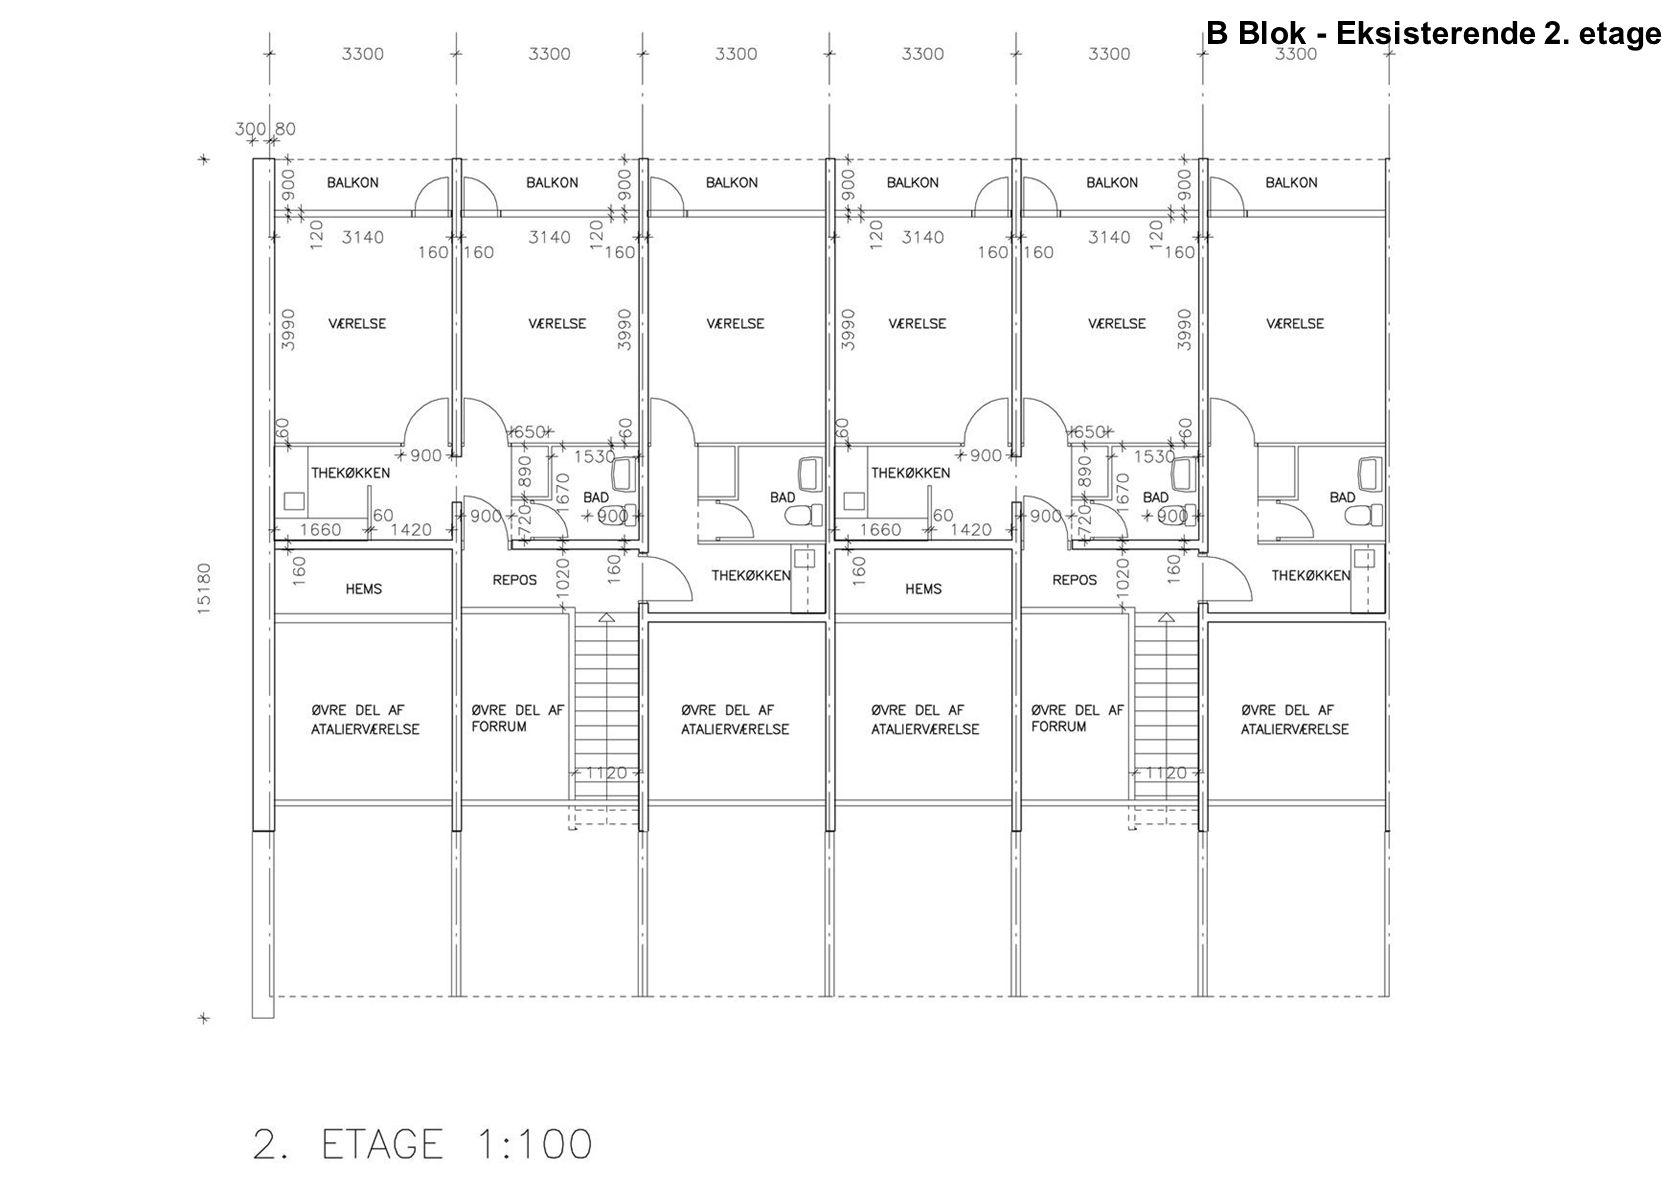 B Blok - Eksisterende 2. etage